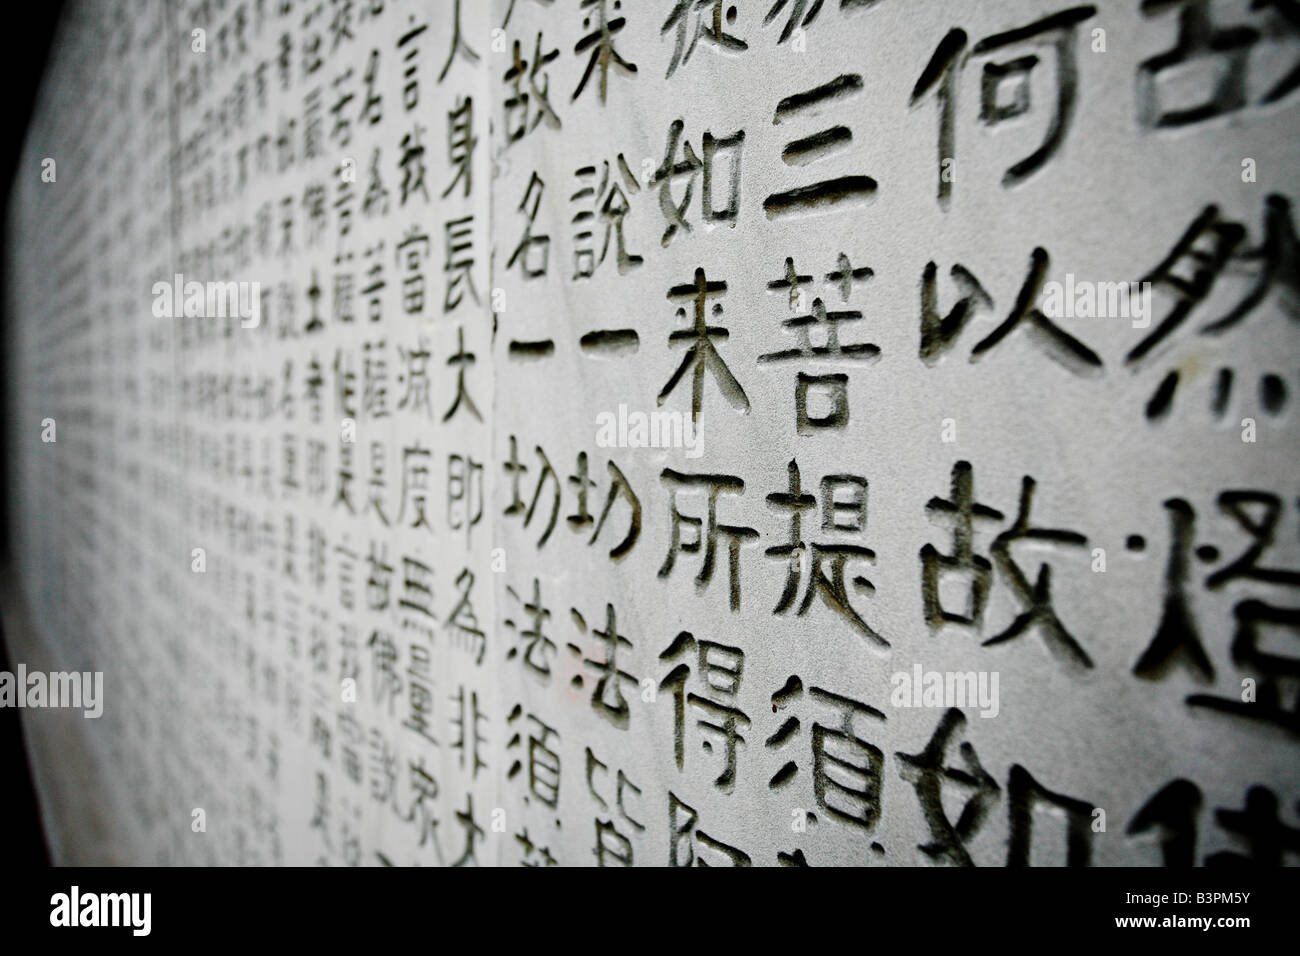 Chinese Kanji Symbols Stock Photos Chinese Kanji Symbols Stock